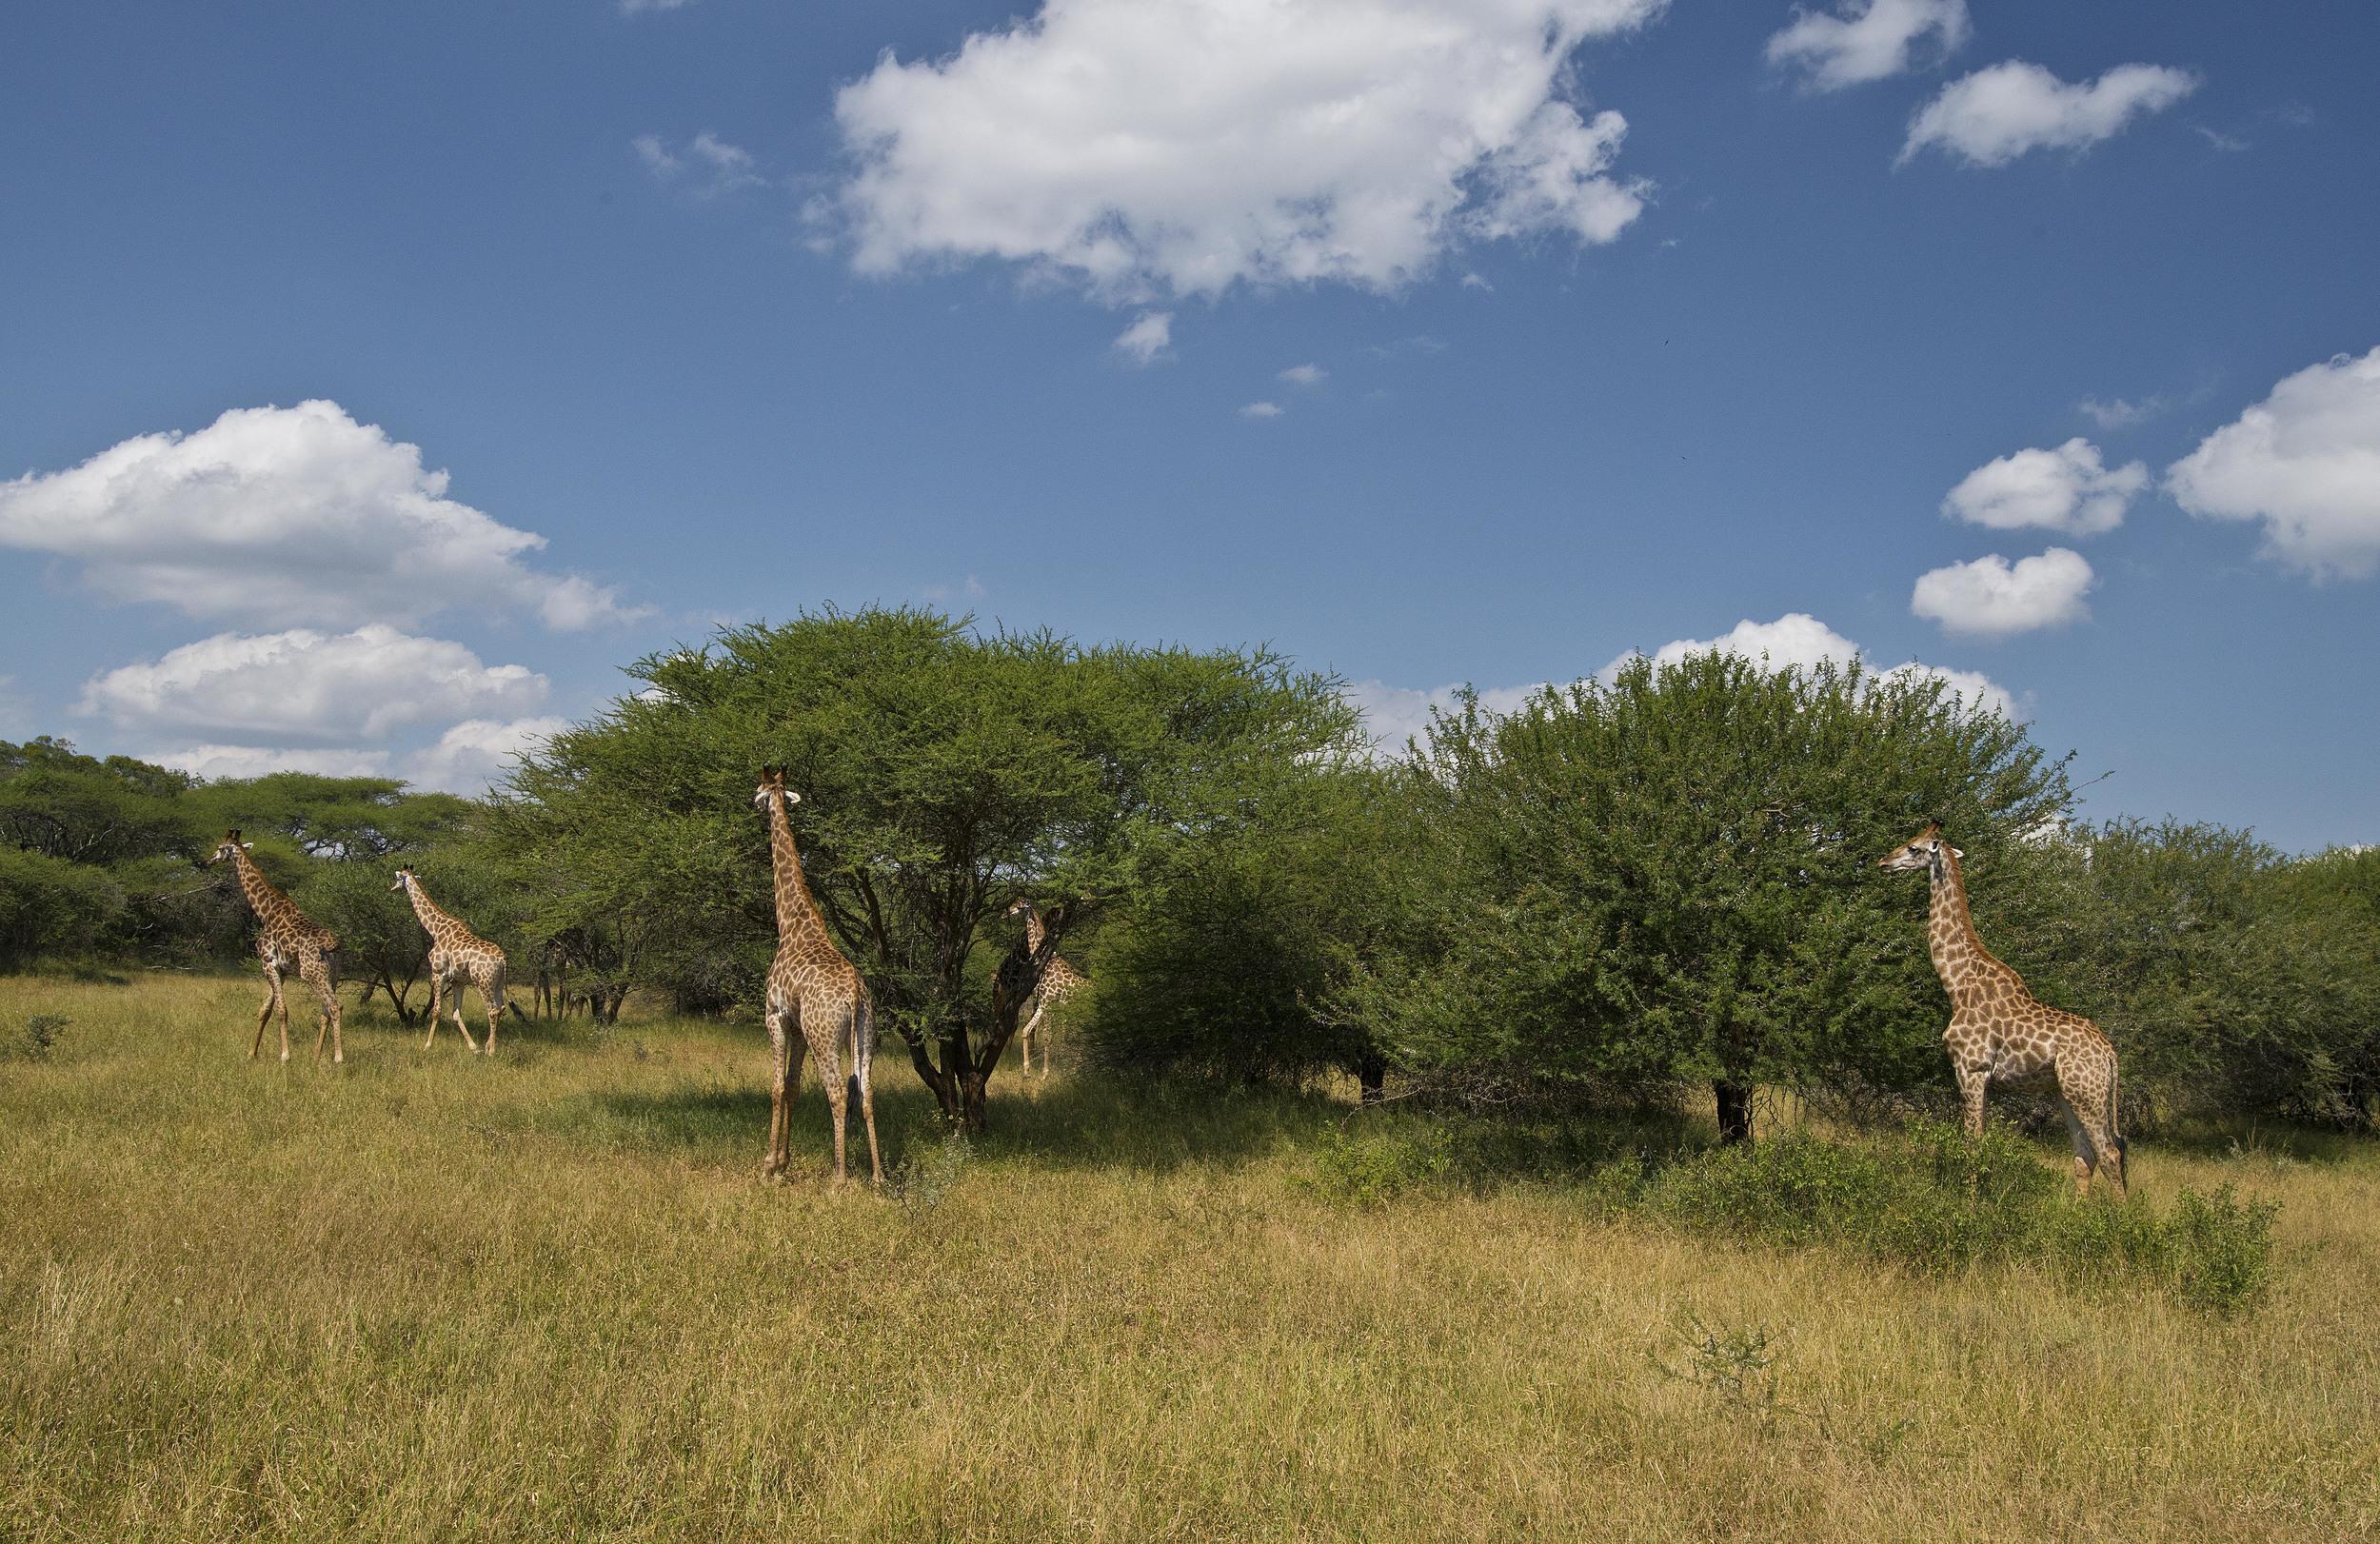 130420_DSC3896 Giraffe Herd Feed on Acacia Trees.jpg